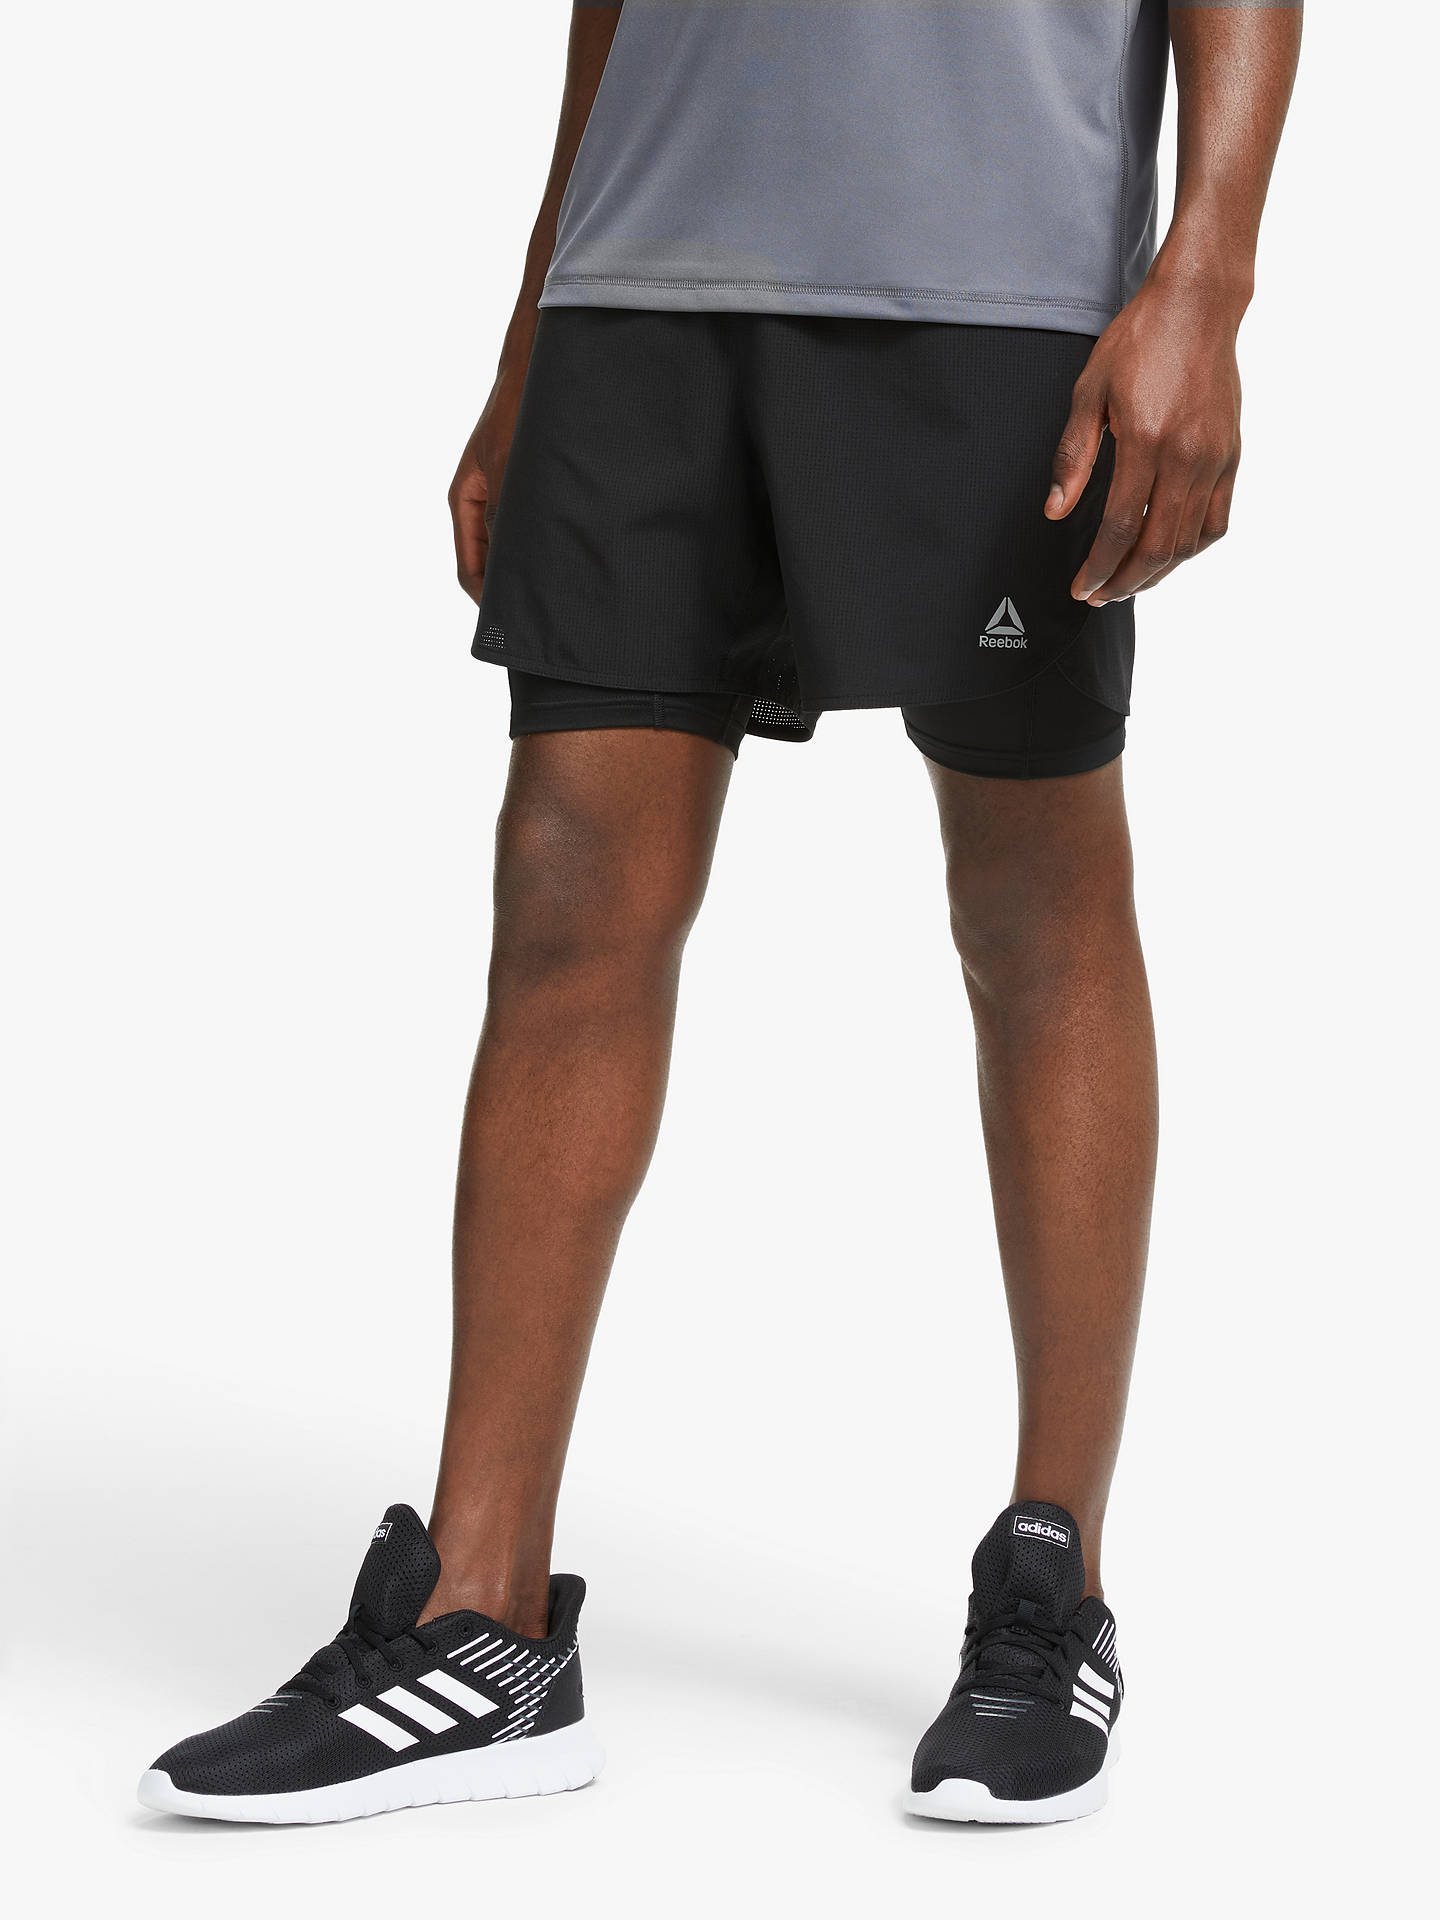 713e28c3 Reebok One Series Running Epic 2-in-1 Running Shorts, Black